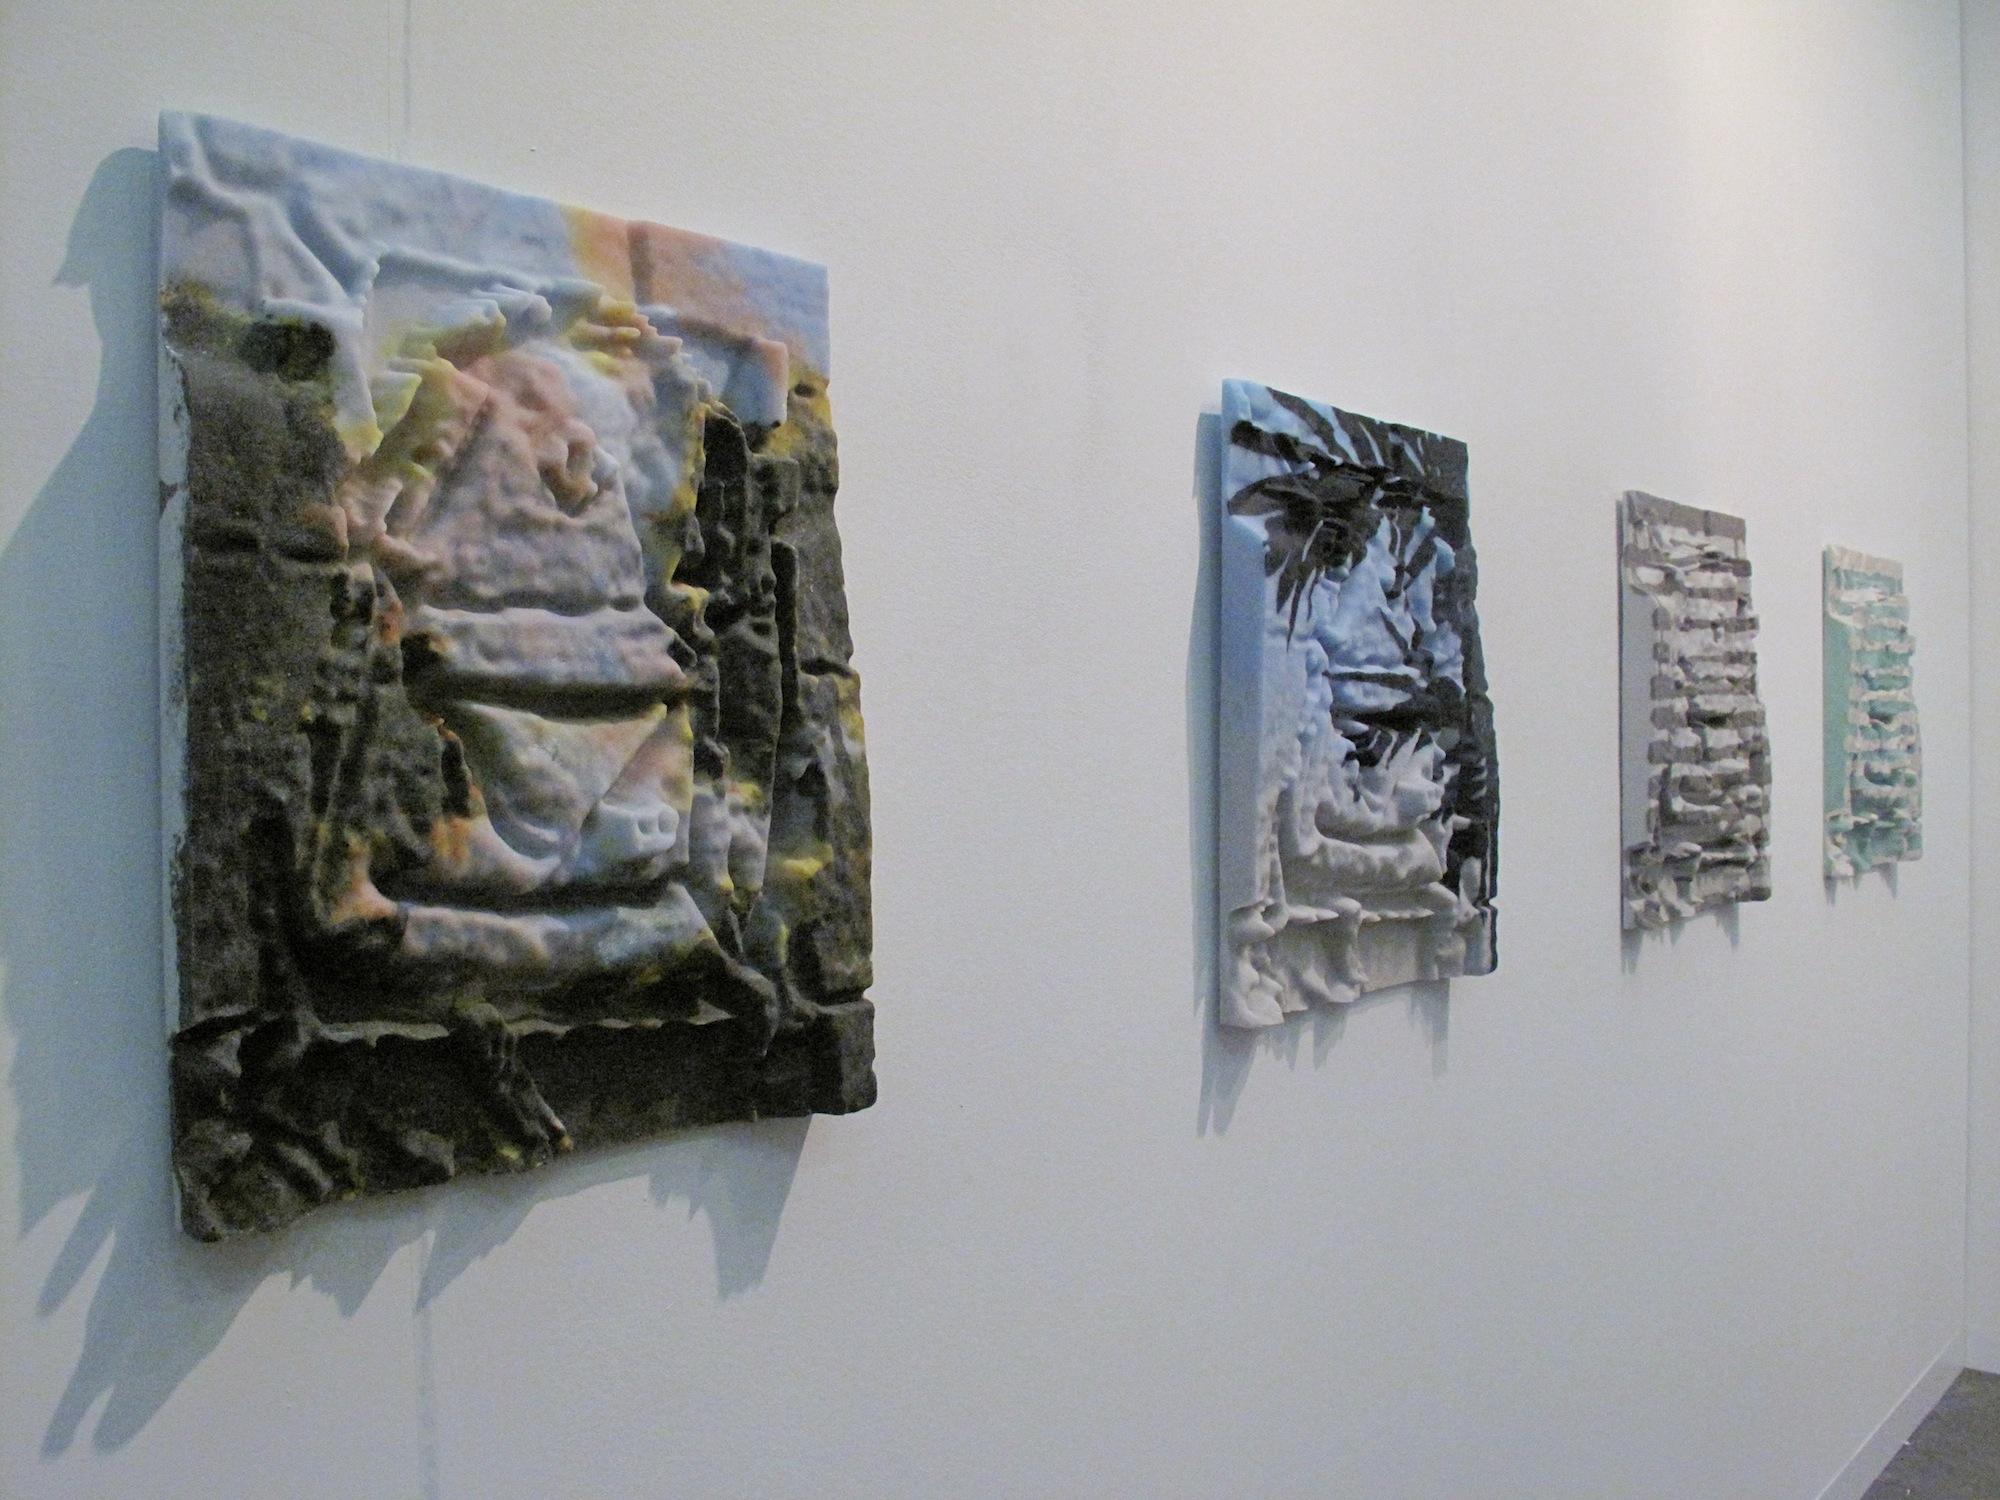 M + B Gallery,  Dwyer Kilcollin, Various works, 2014 all silica, glass, feldspar, granite, urethane, bronze hardware, signed verso, Unique The Armory Show, New York, 2014, Pier 94